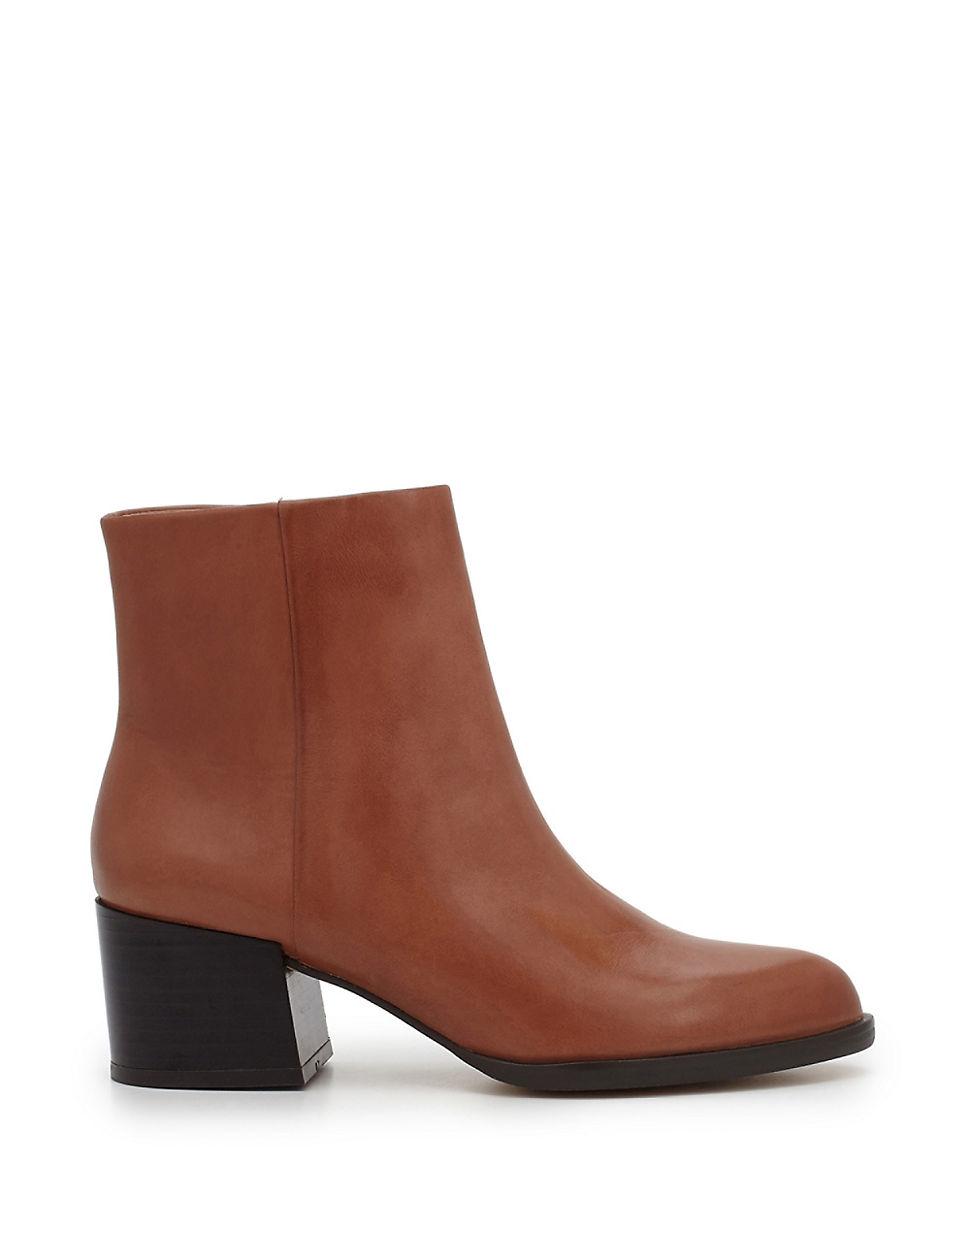 Womens Boots Sam Edelman Joey Saddle Tan